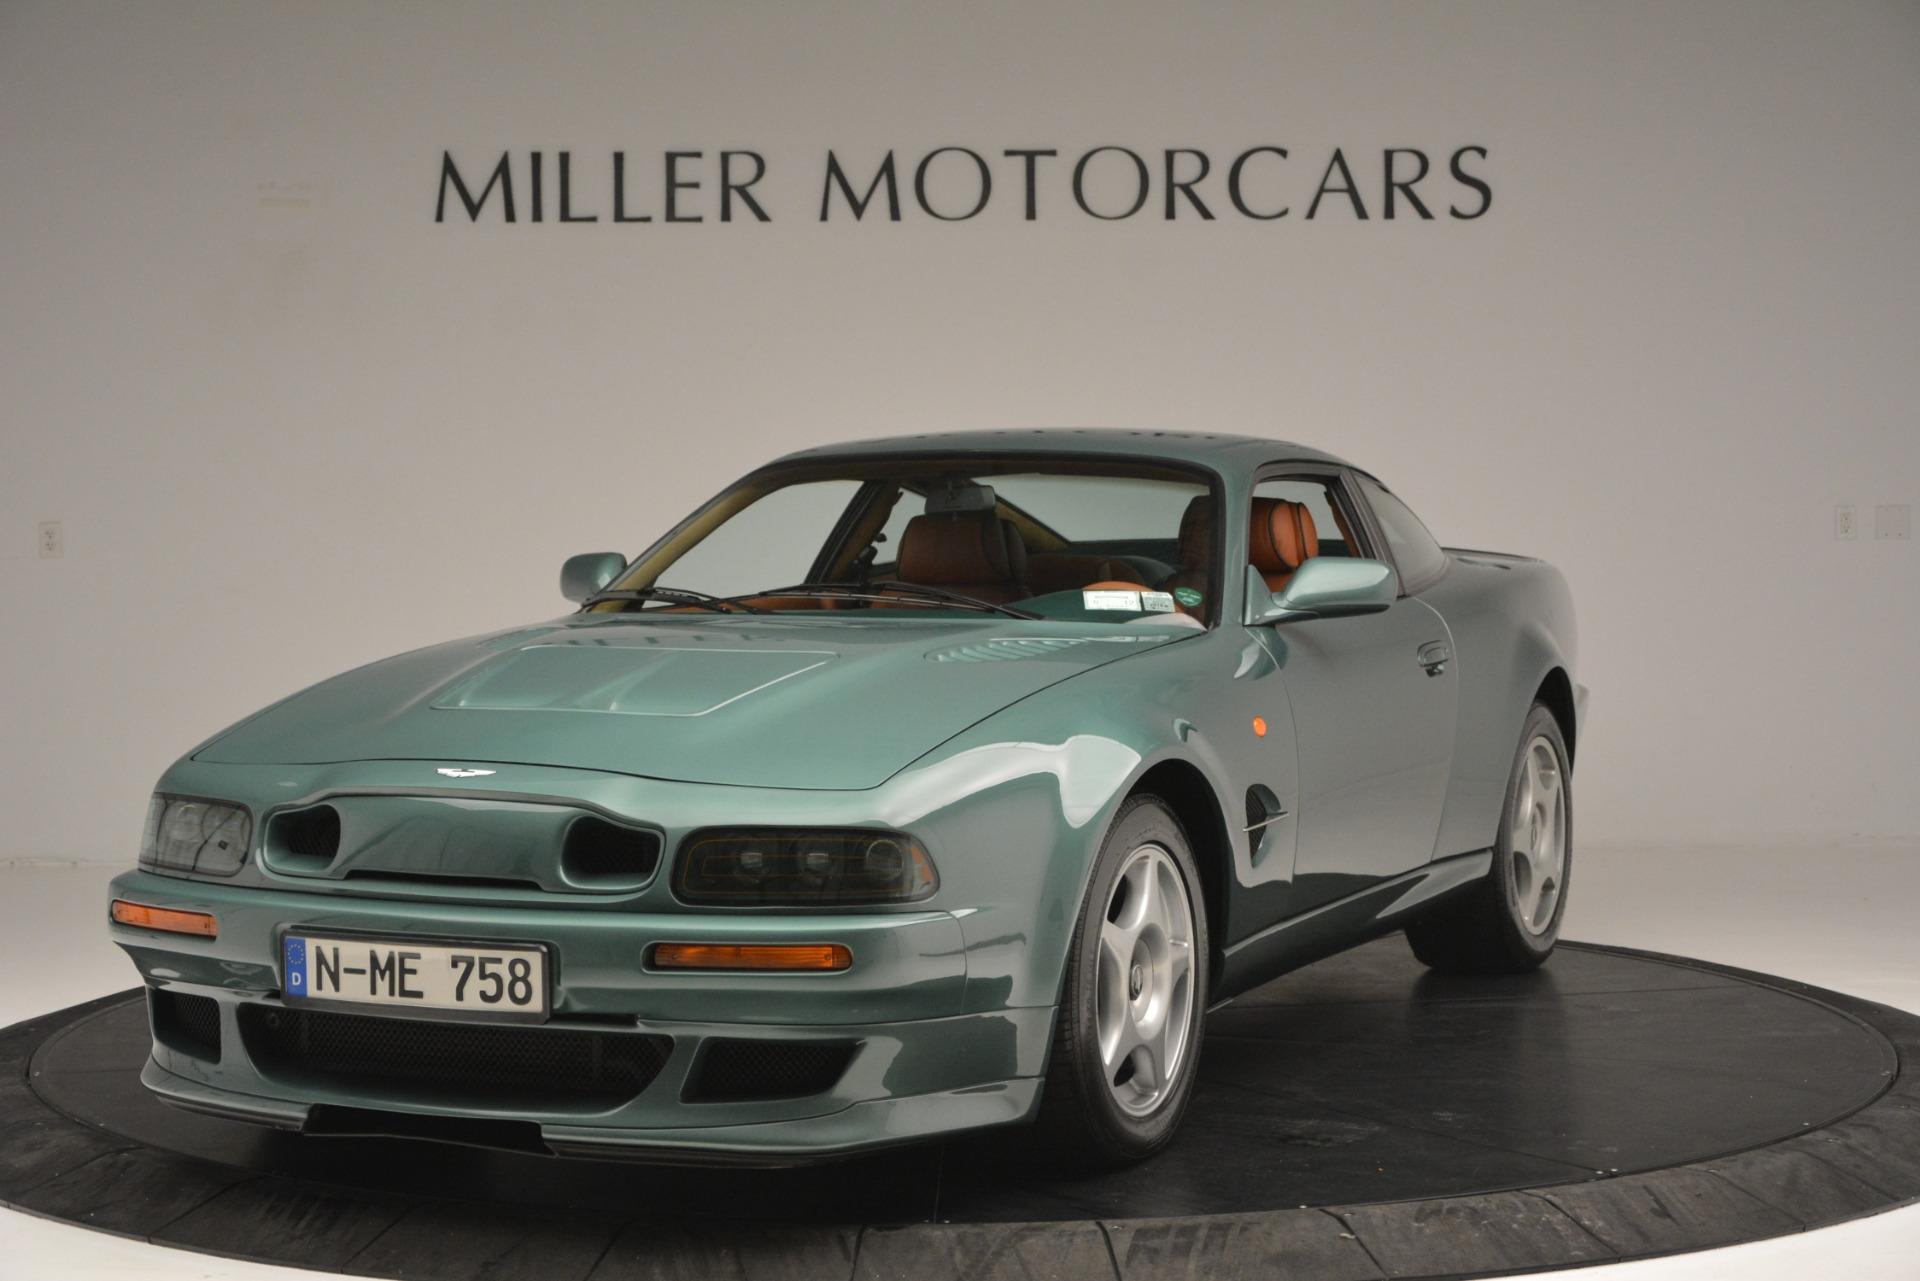 Used 1999 Aston Martin V8 Vantage Le Mans V600 Coupe For Sale In Greenwich, CT. Alfa Romeo of Greenwich, 7449C 2789_p2